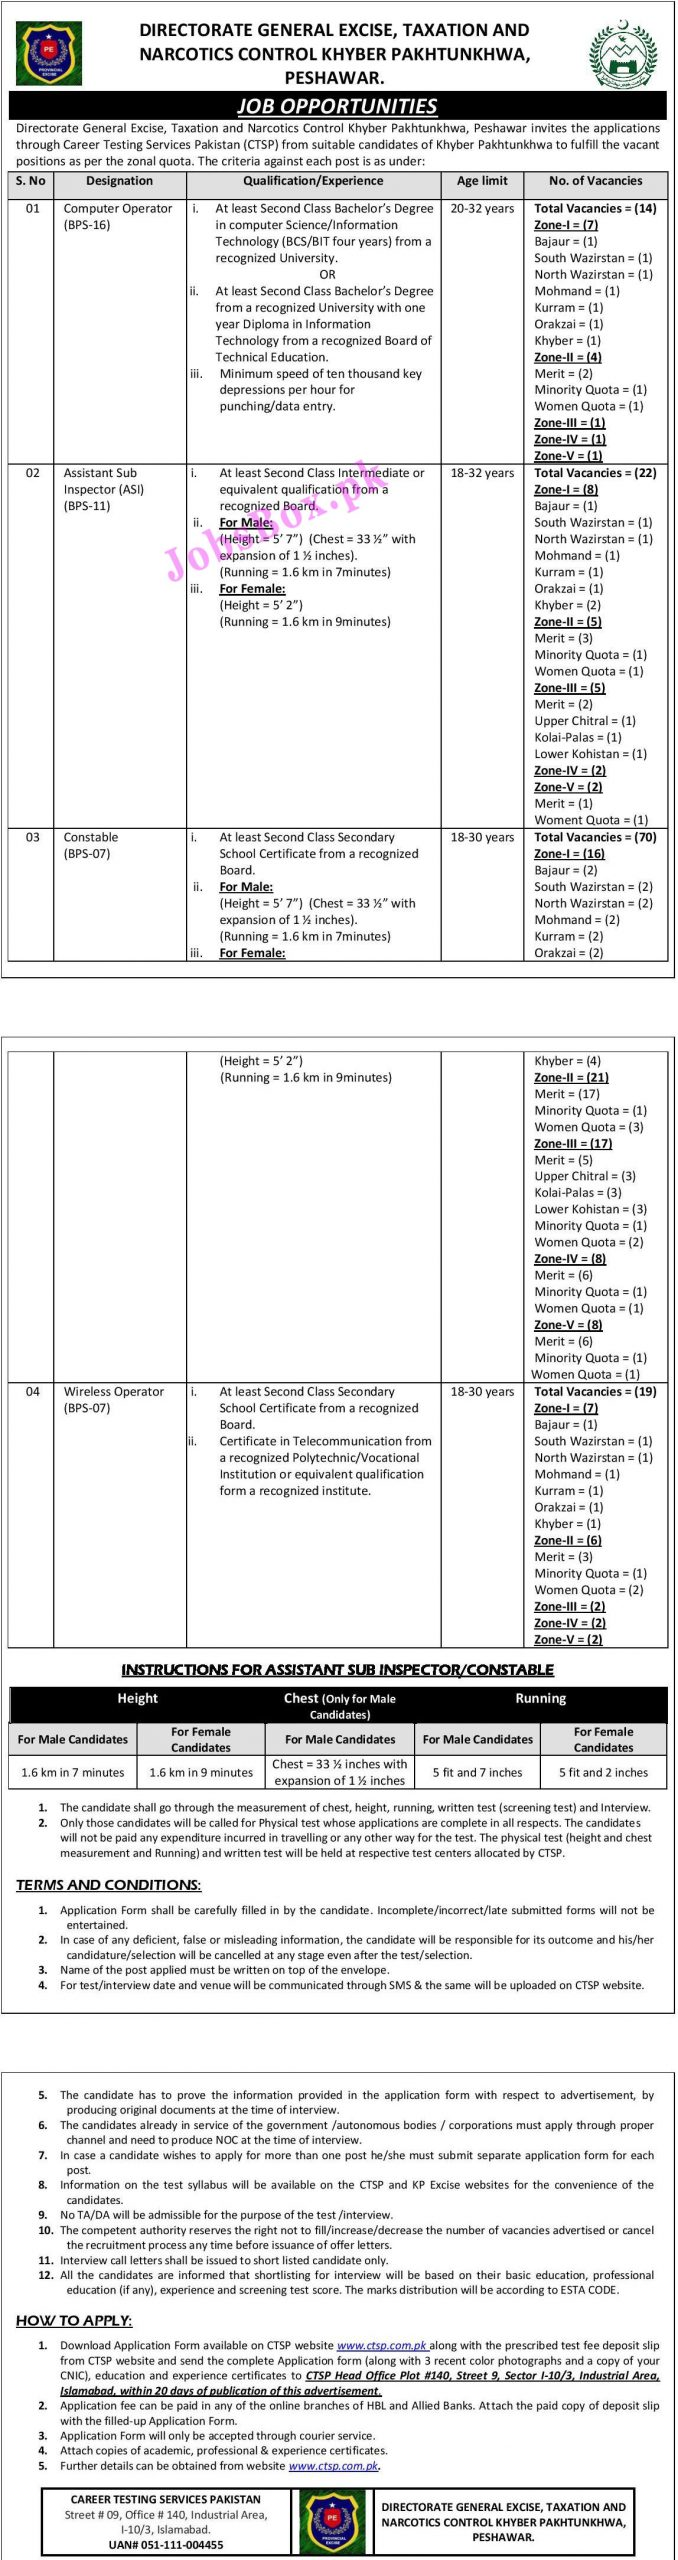 Excise Taxation and Narcotics Control Department KPK Jobs 2021 via CTSP